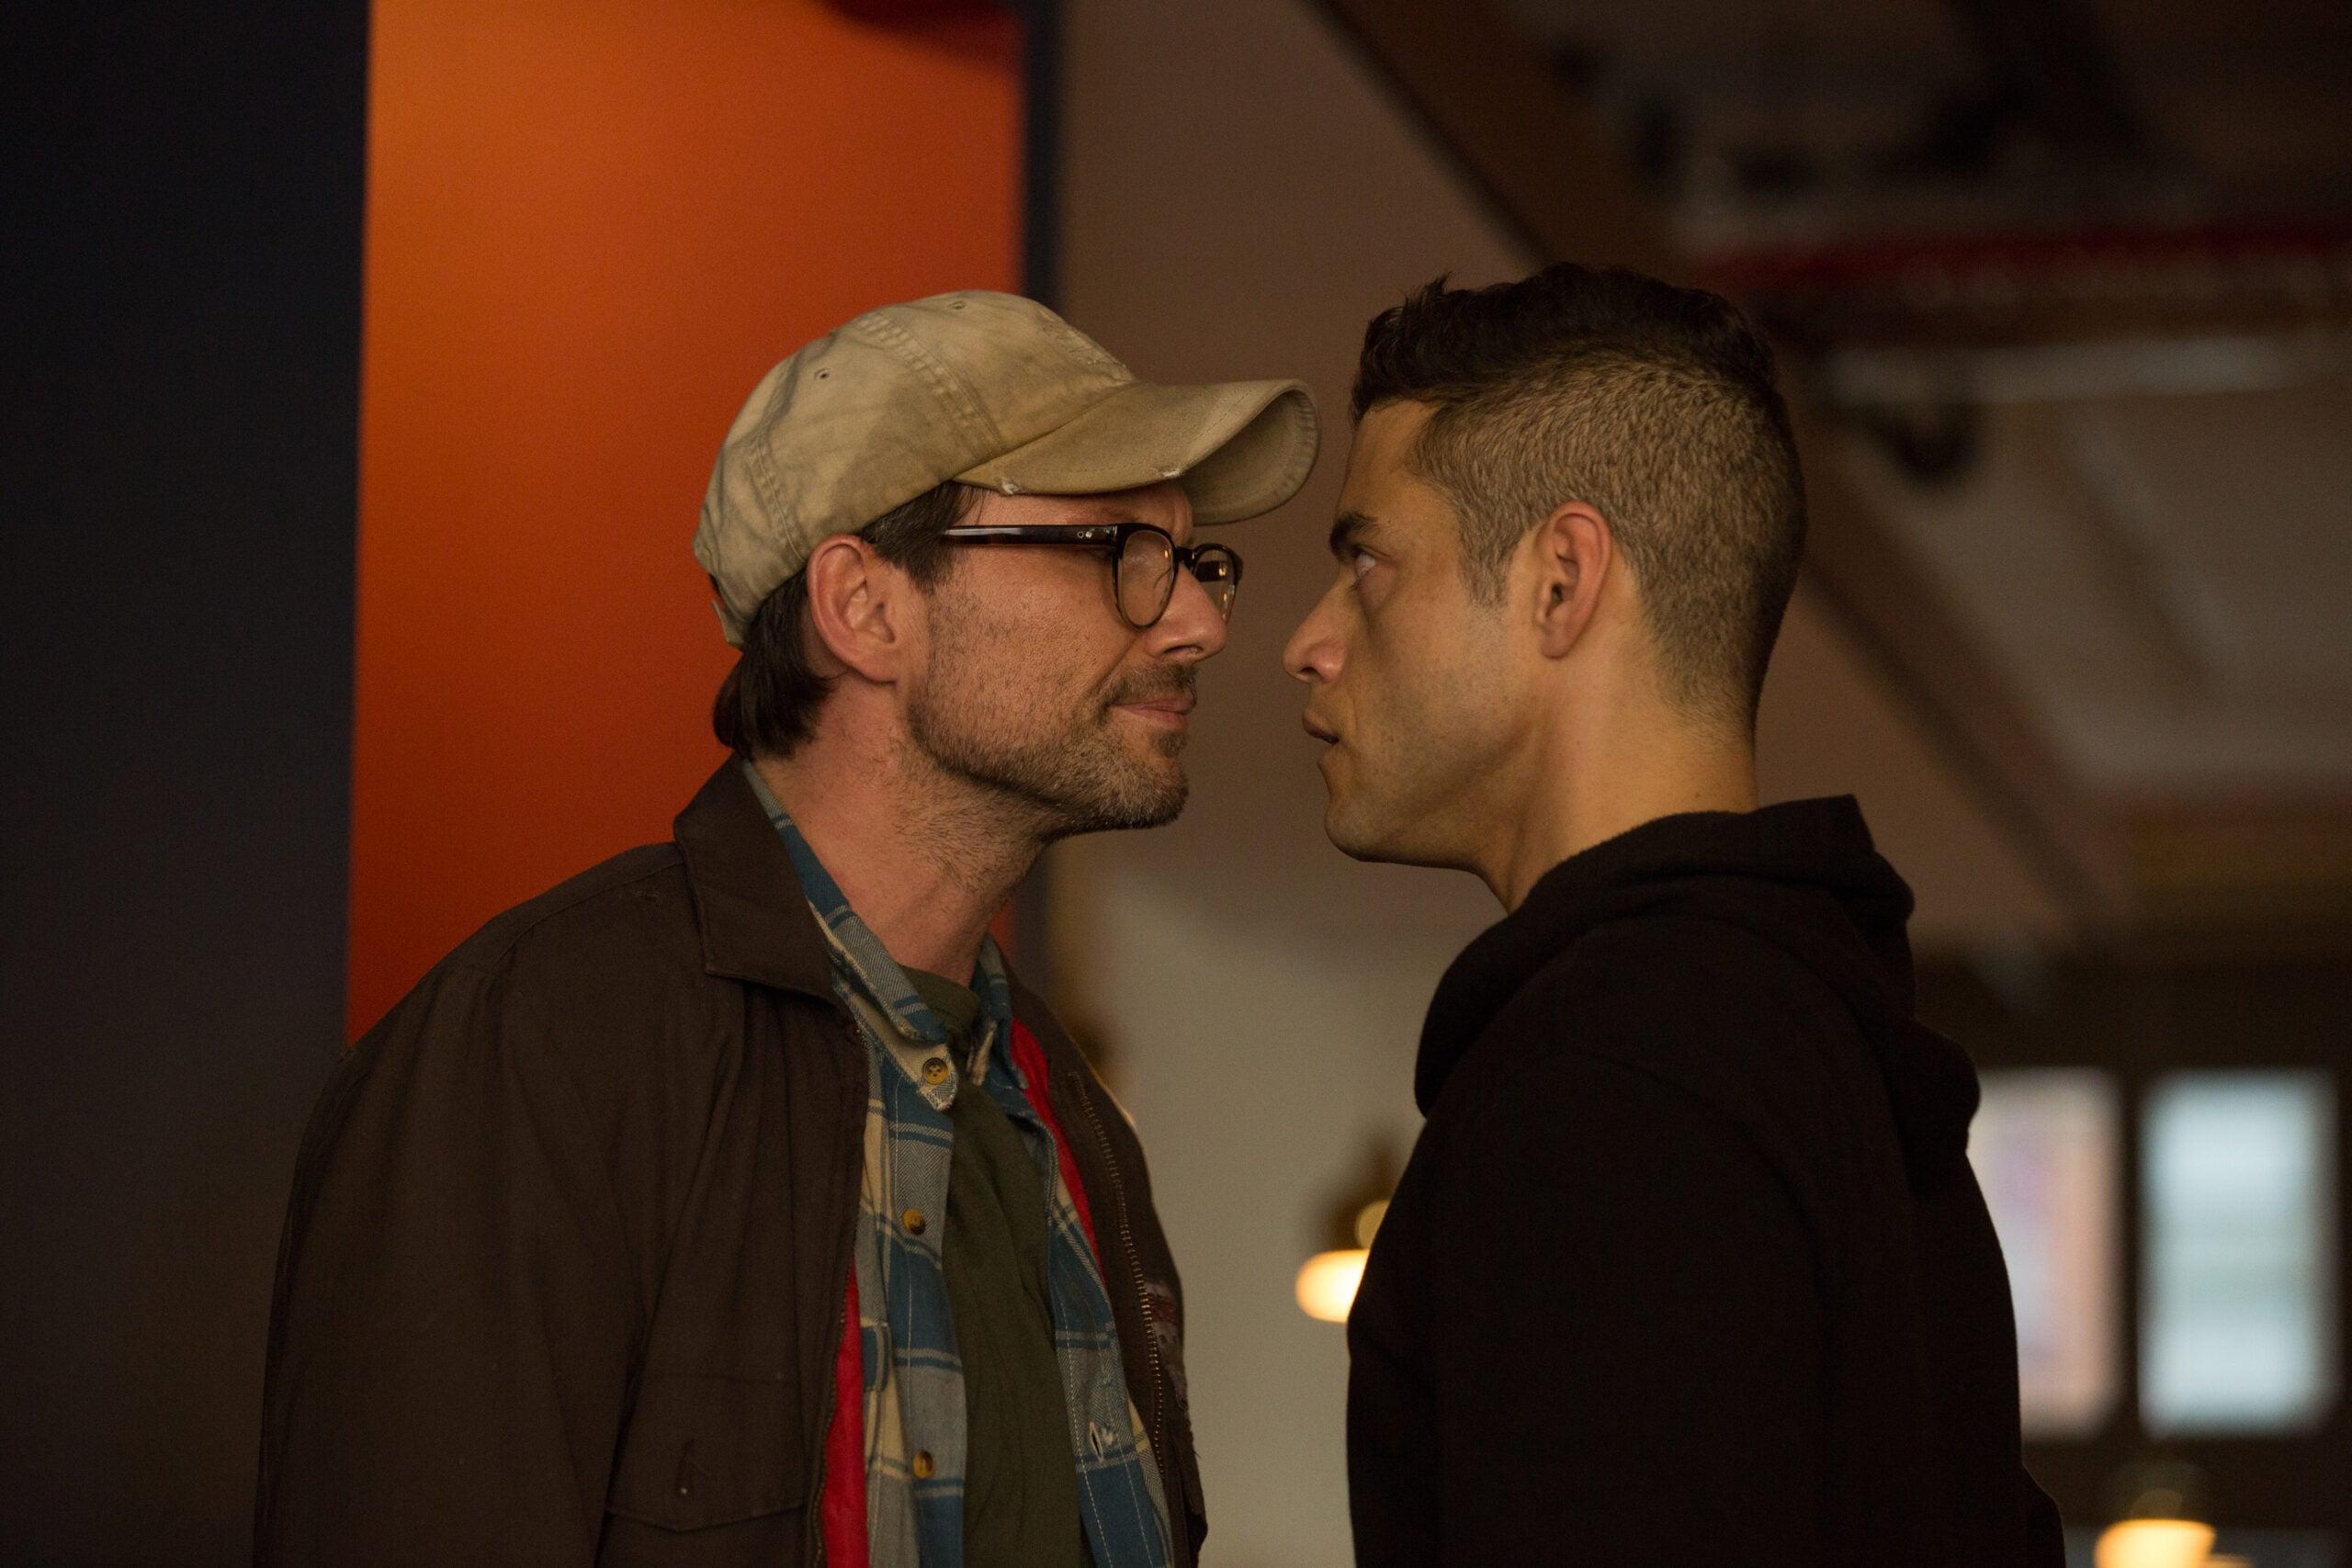 Mr. Robot (Christian Slater) faces hacker Elliot Alderson (Rami Malek) in the season one finale of 'Mr. Robot'